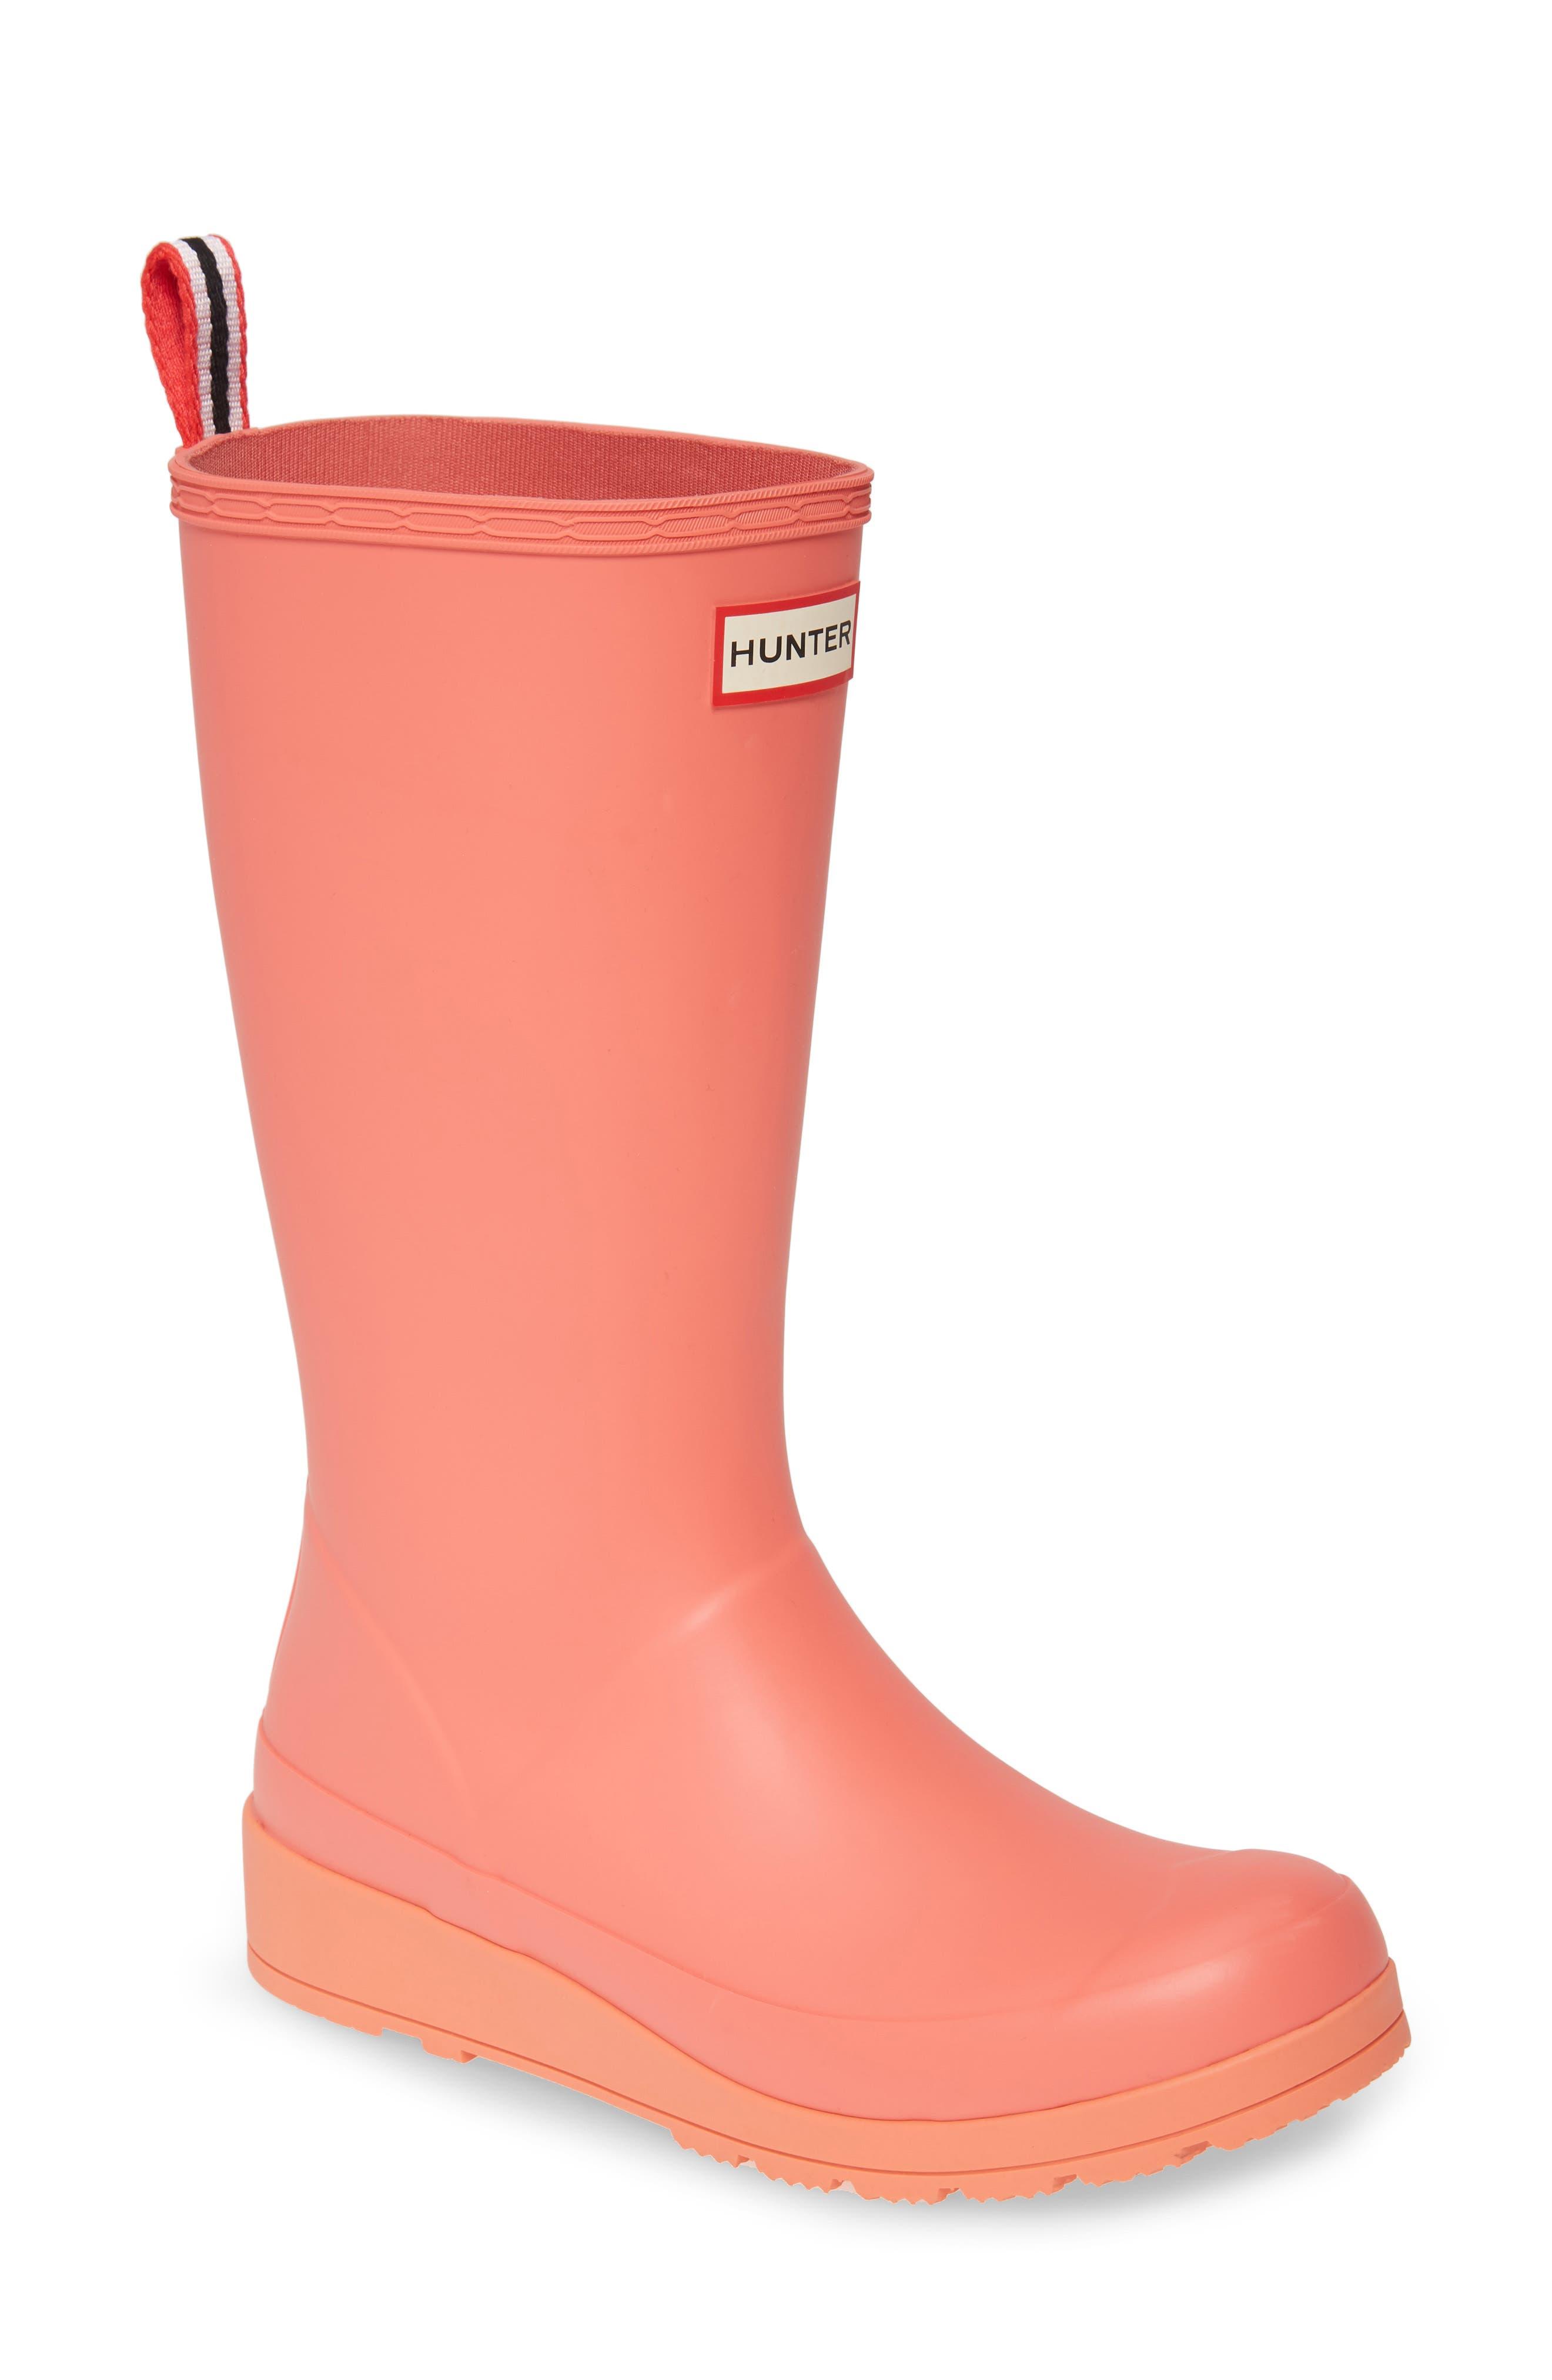 Hunter Original Play Tall Waterproof Rain Boot, Pink